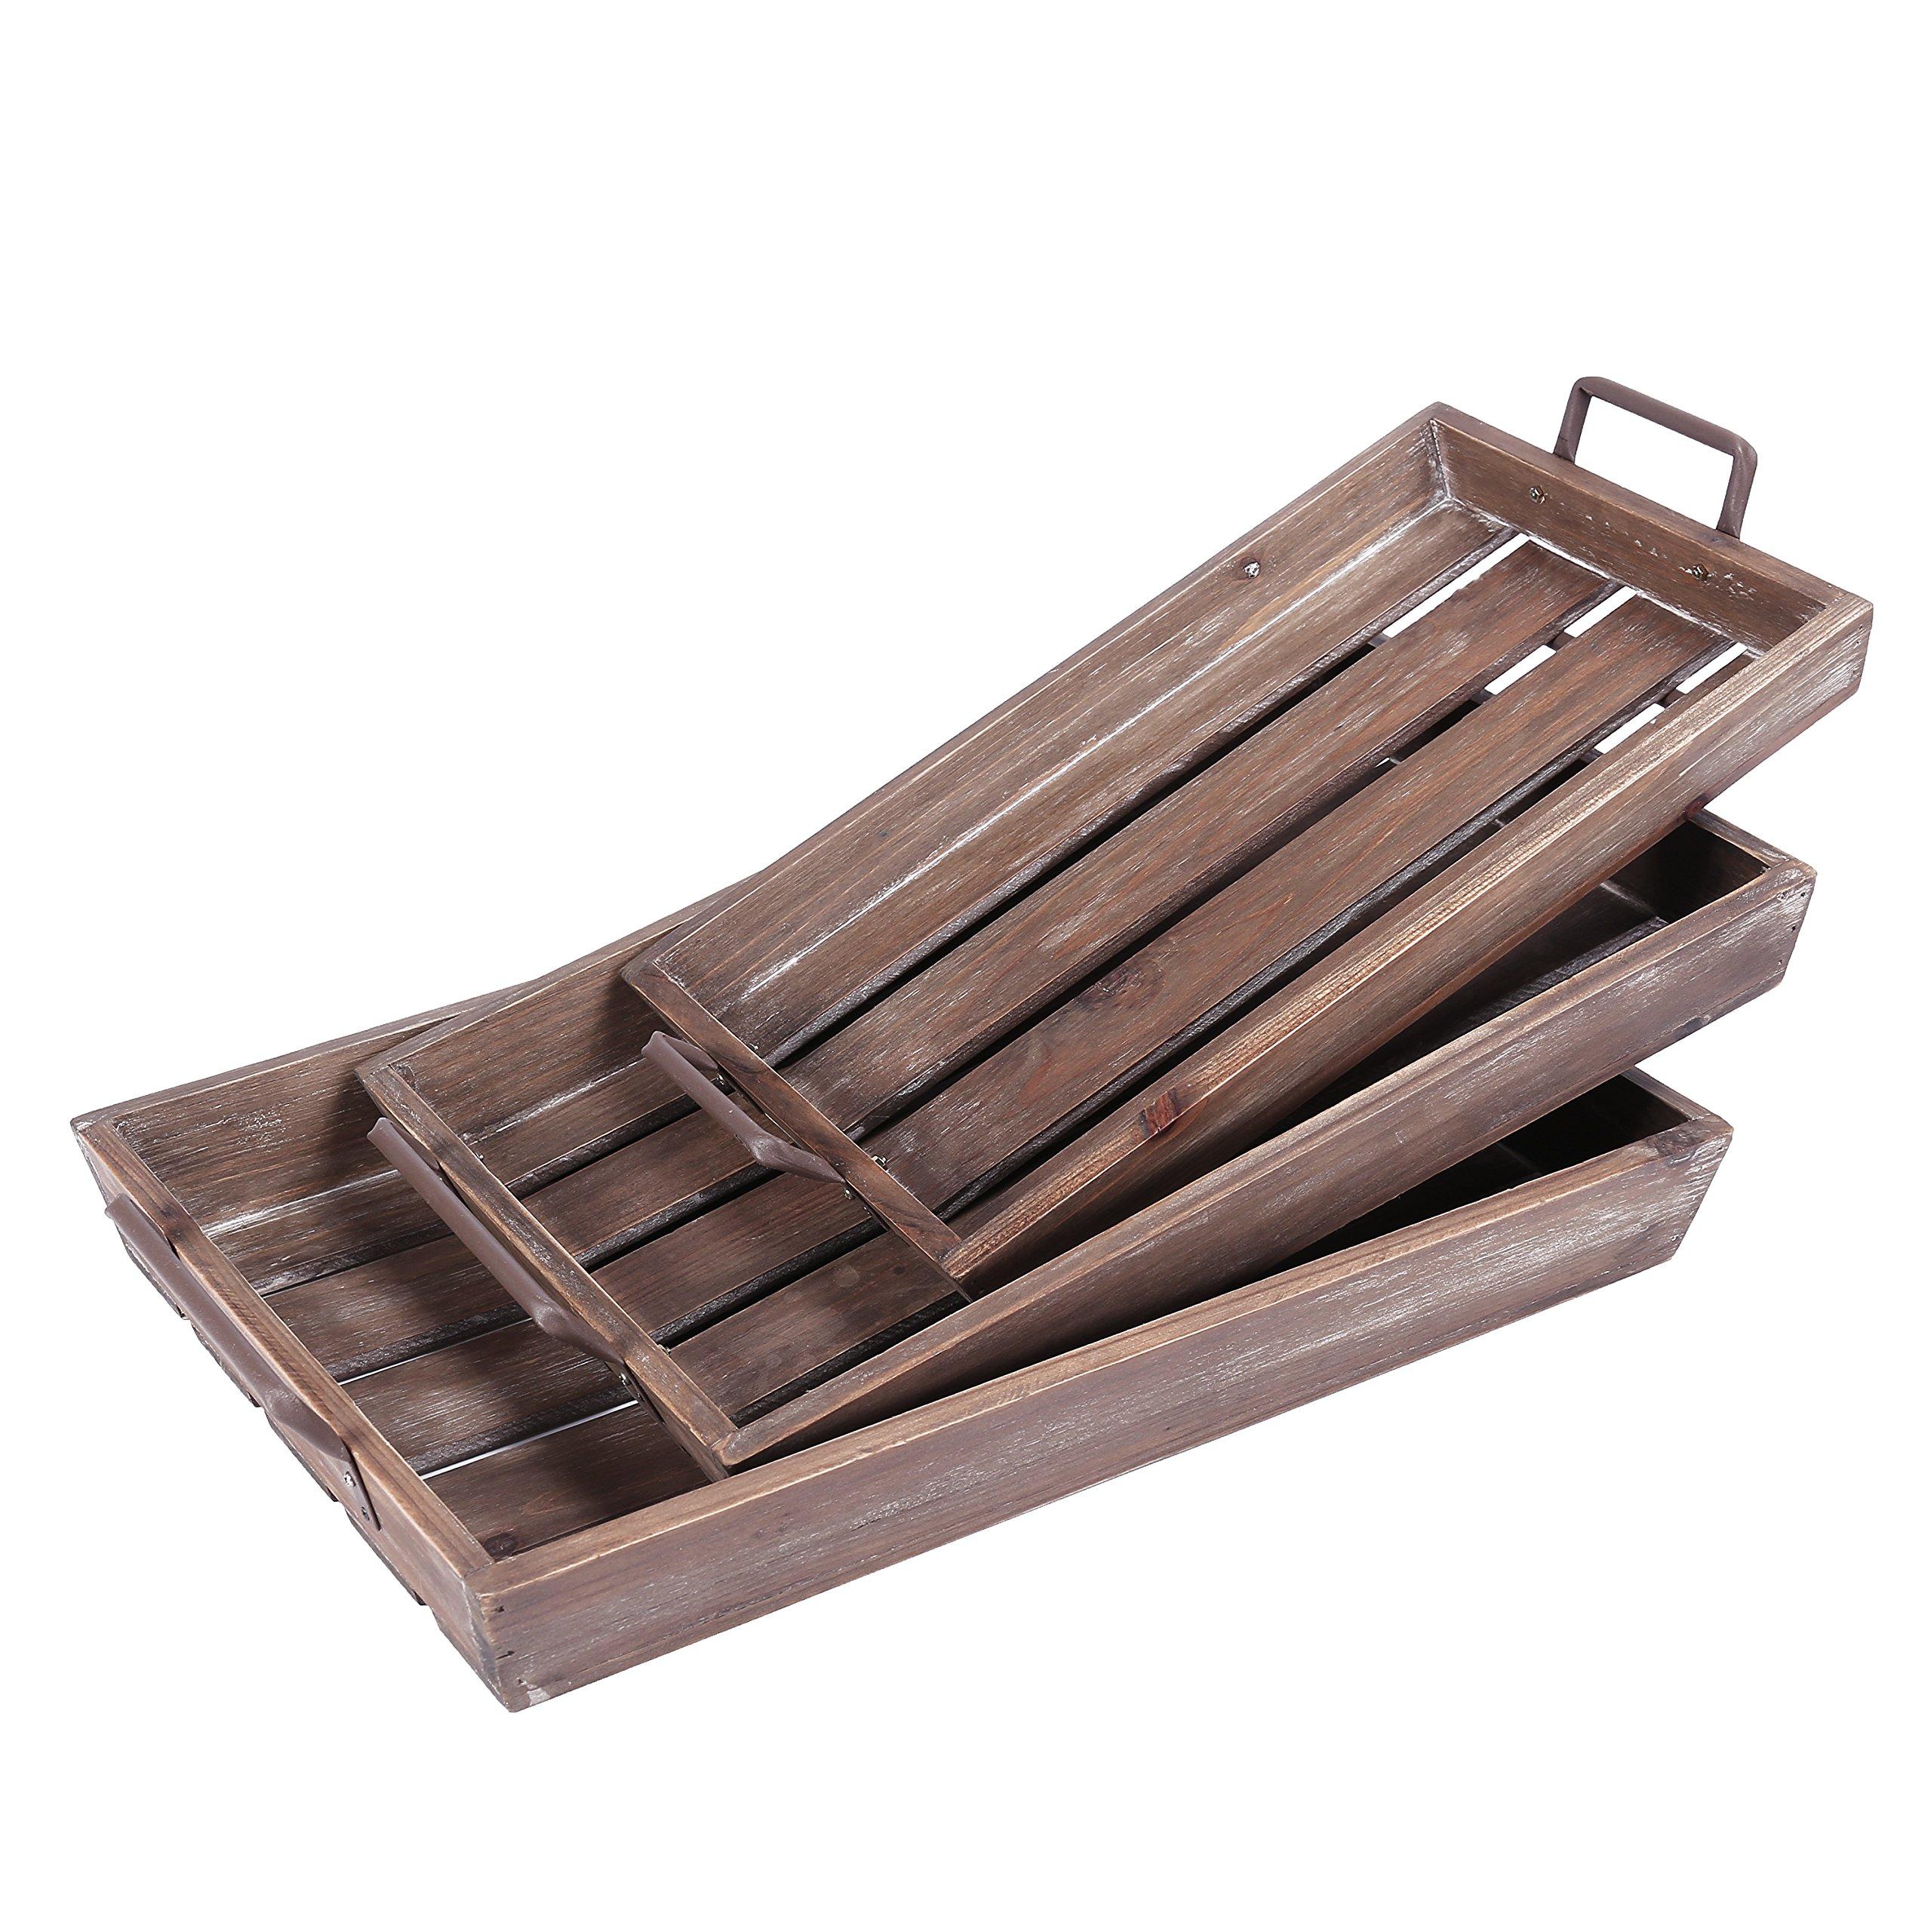 Distressed Wood Slat Nesting Breakfast Serving Trays w/ Antique-Style Metal Handles, Set of 3, Brown